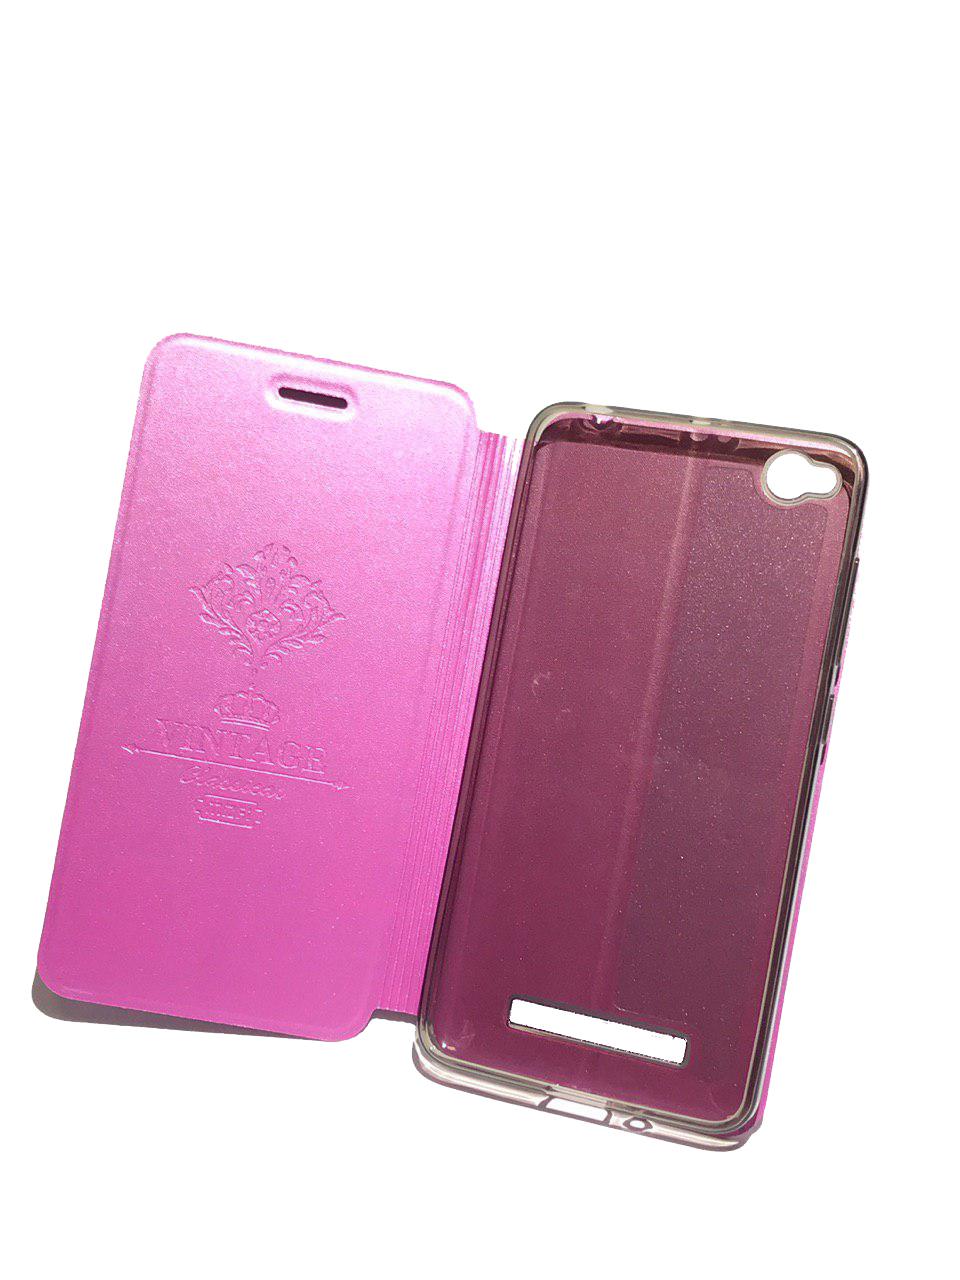 цена на Чехол для Xiaomi Redmi 4X Книжка Pearl Xiaomi Redmi 4X Pink